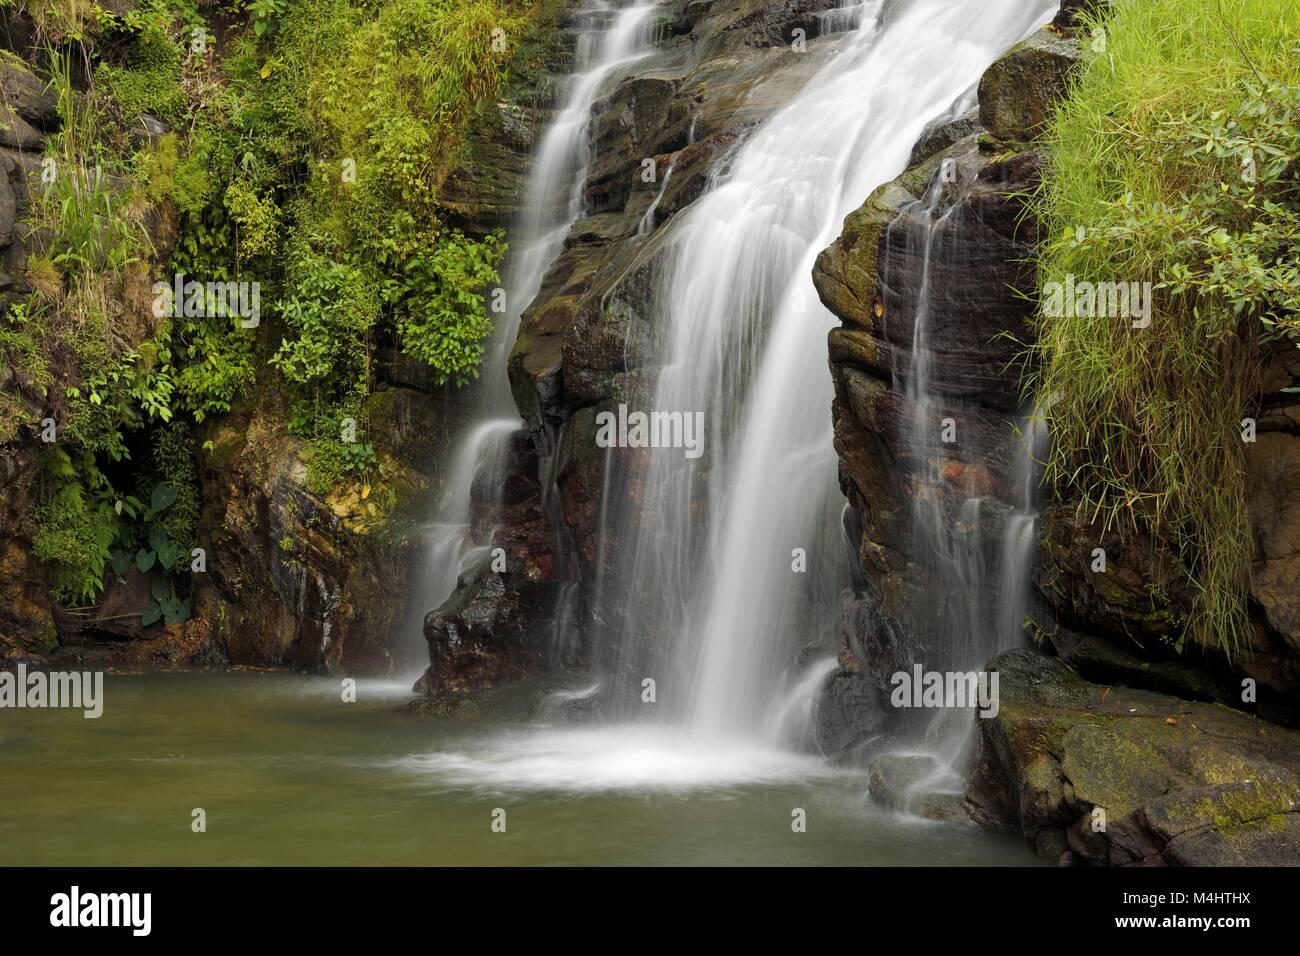 Ravana Falls, Central Province, Sri Lanka - Stock Image